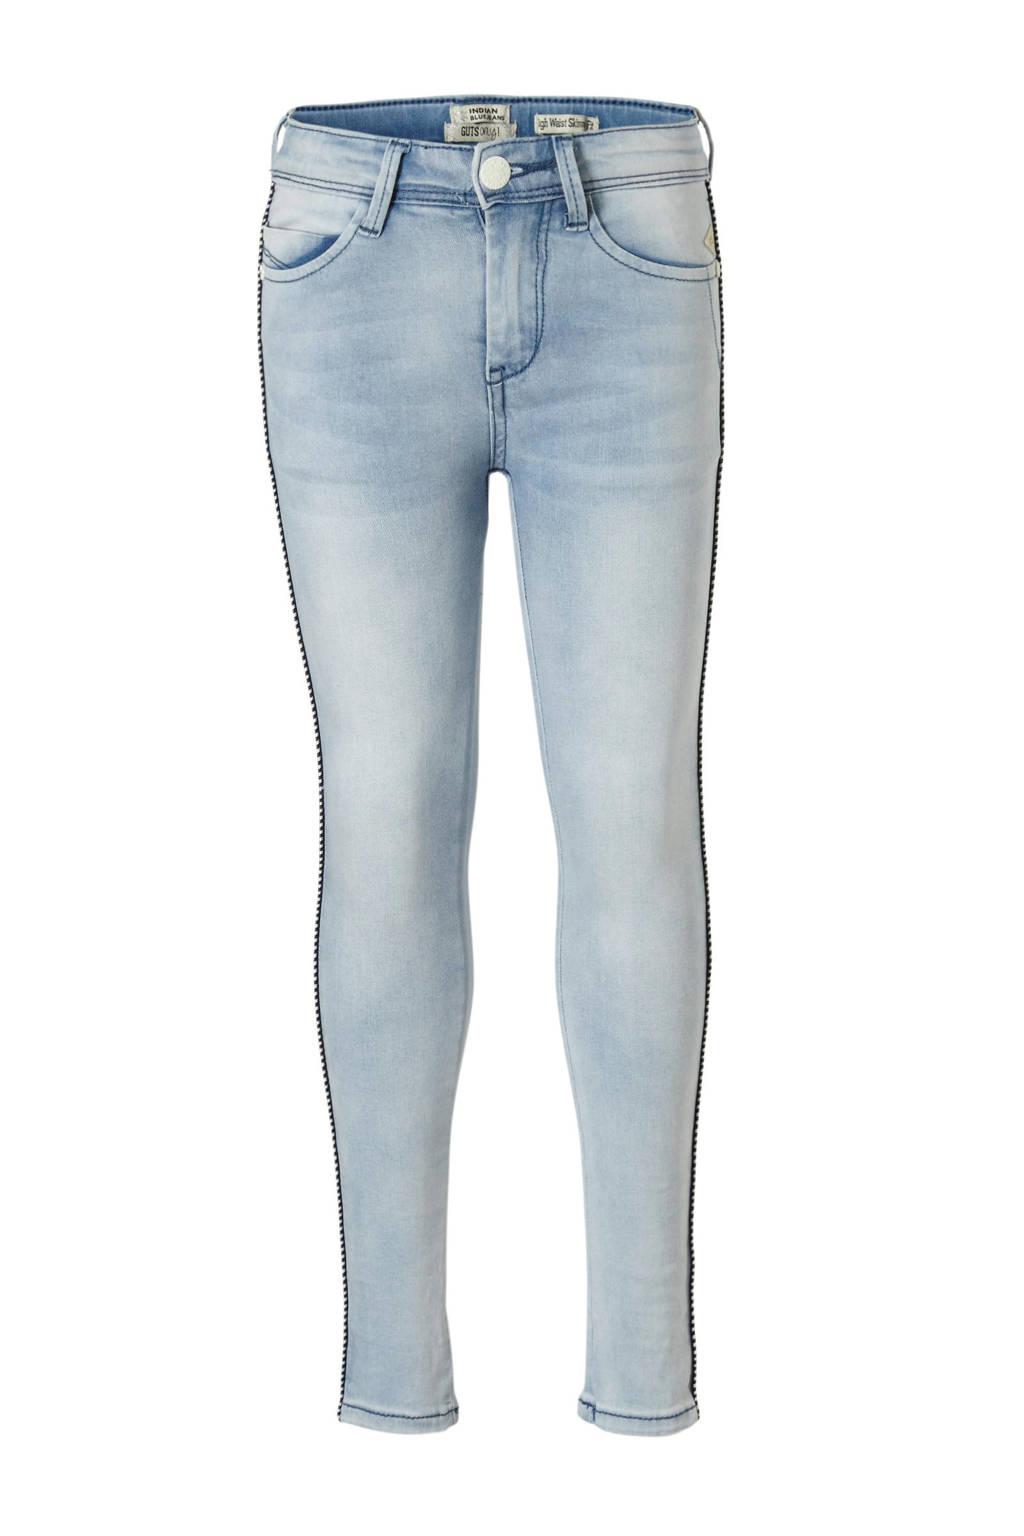 Indian Blue Jeans high waist skinny jeans Lois met zijstreep, Light denim